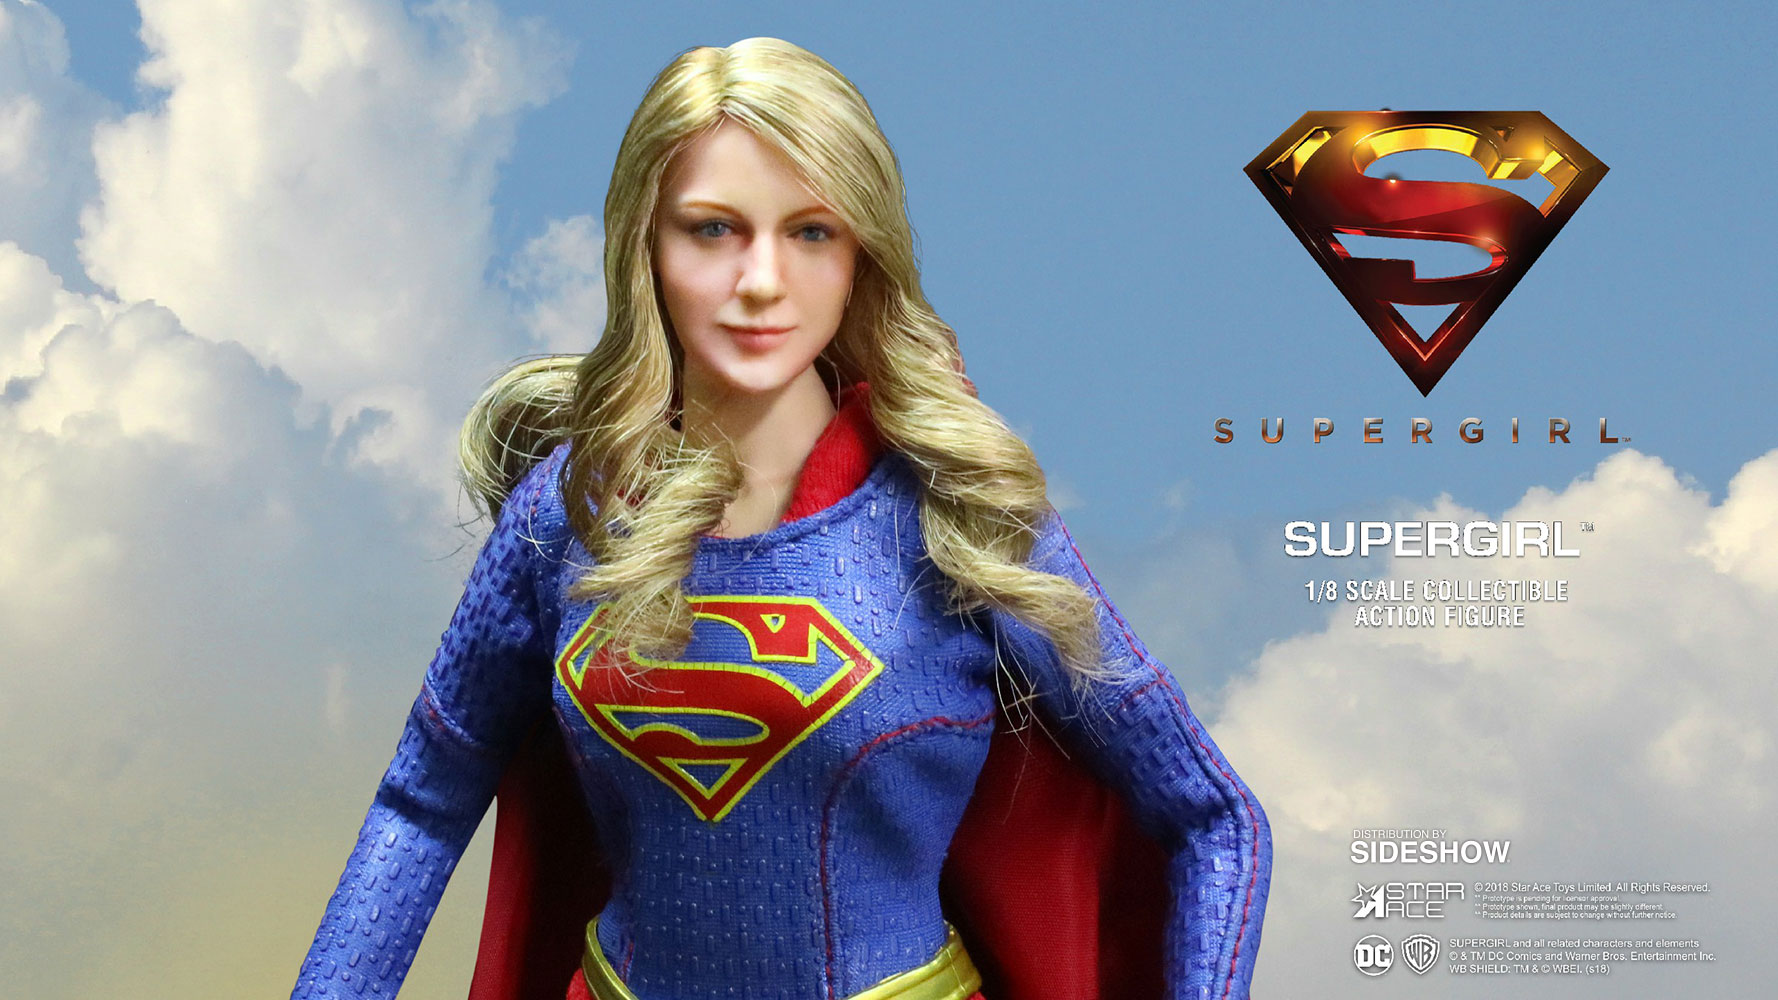 Supergirl (TV Series Inspired)